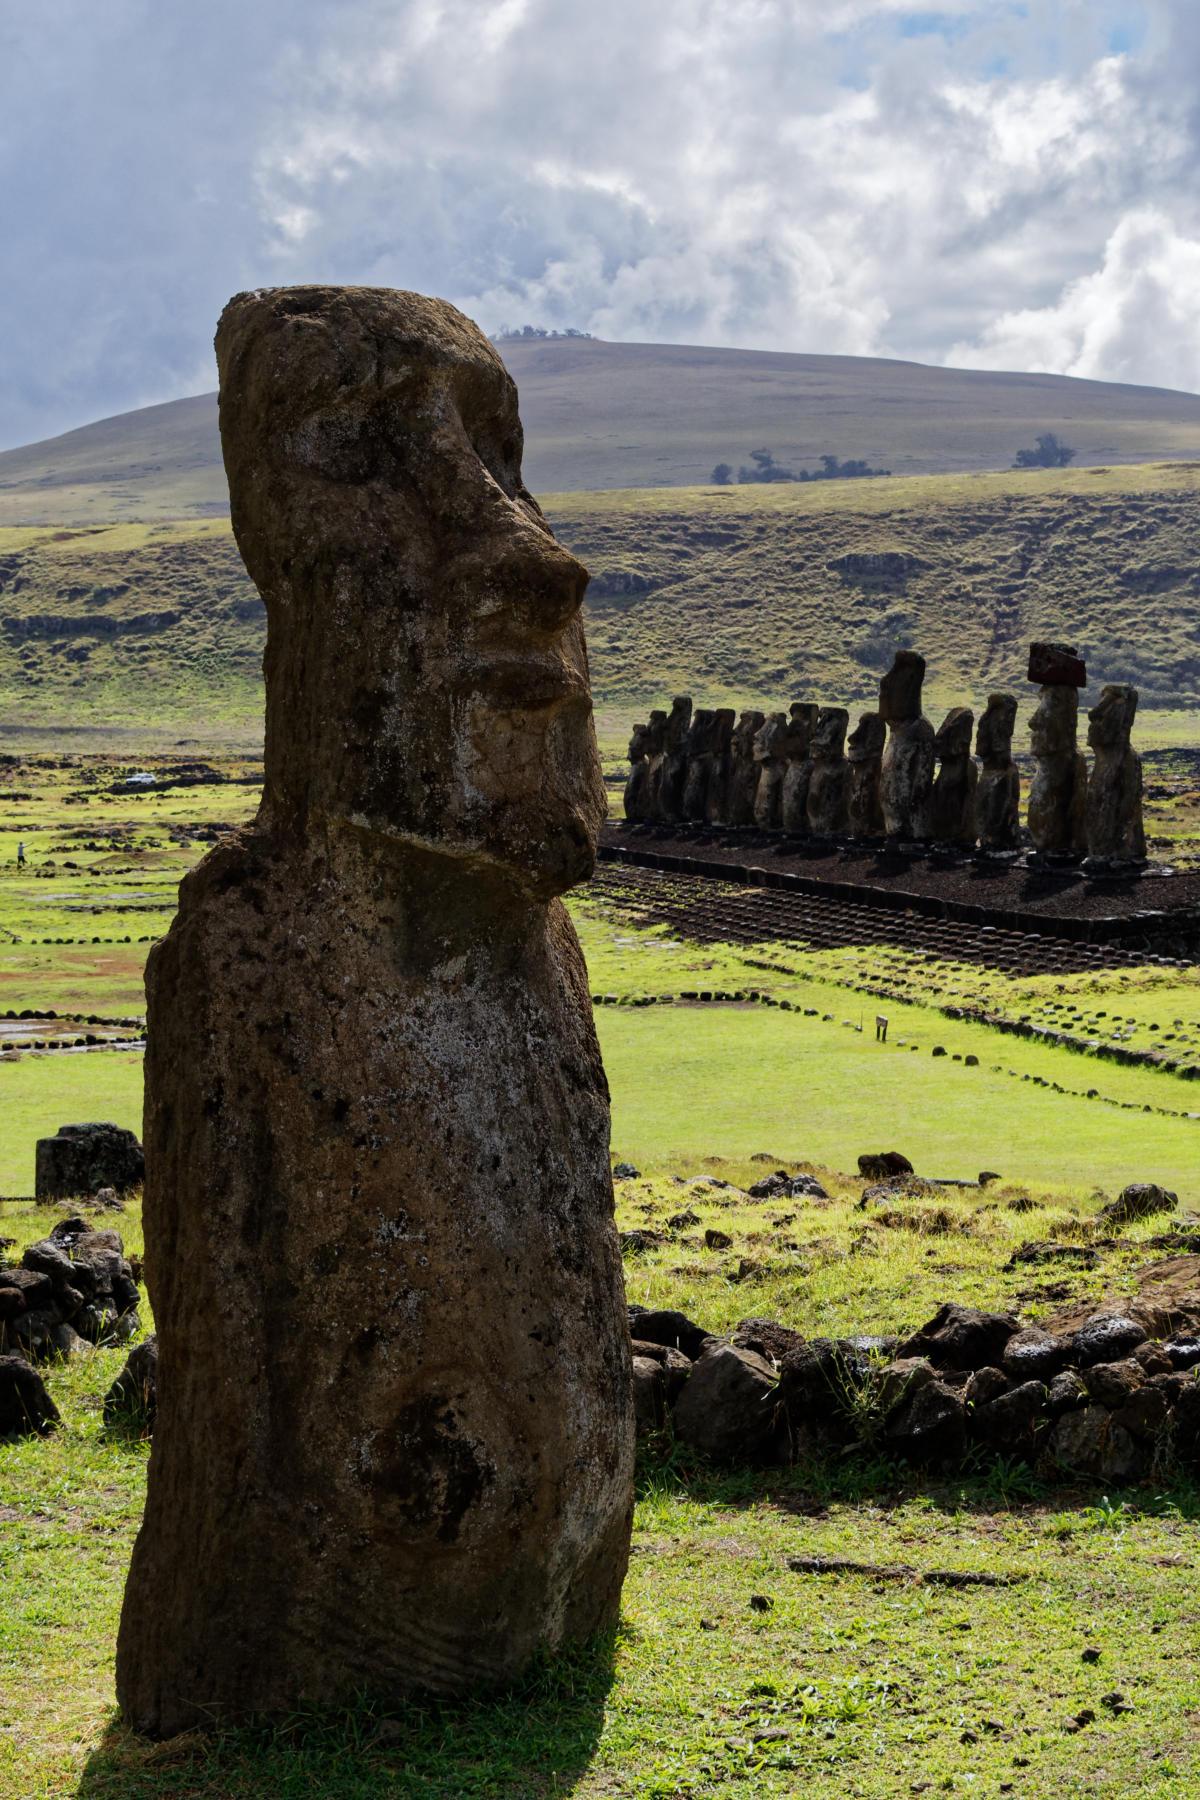 The travelling moai